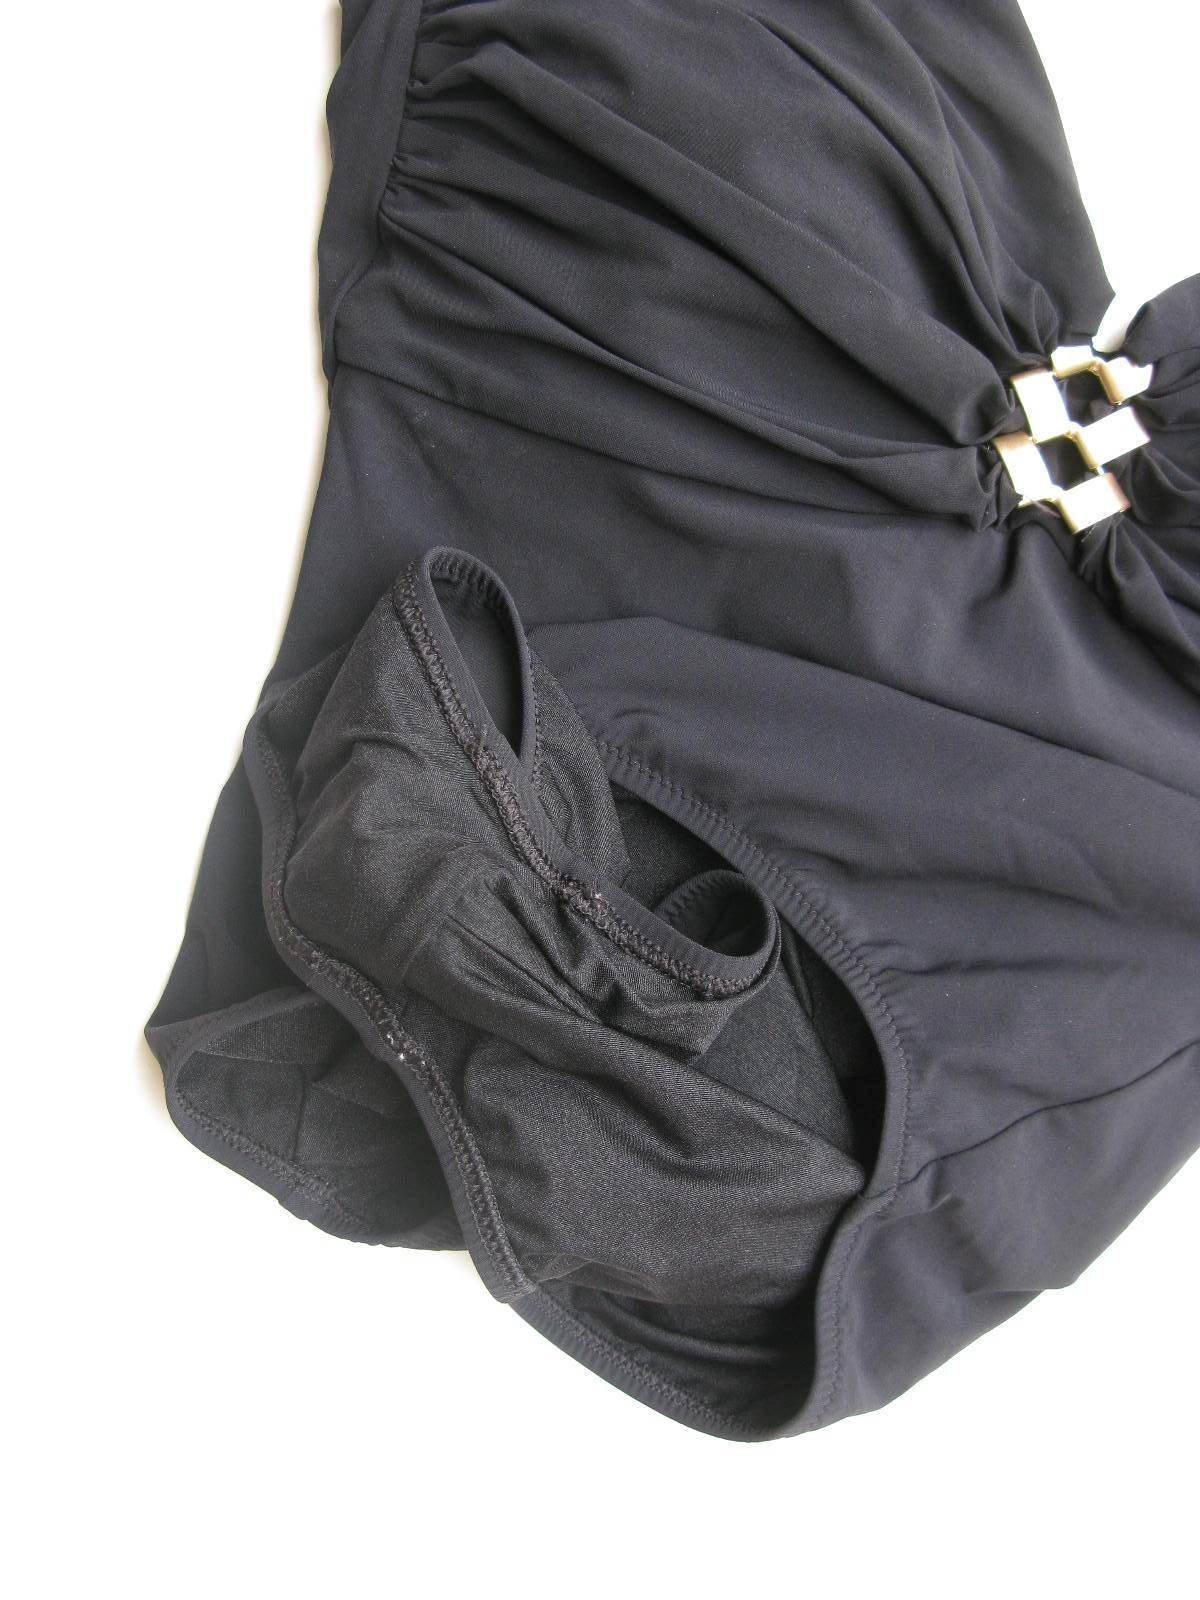 One-Piece Swimsuit Bathing Suit GOTTEX Koh Samui Tank Swimsuit 10 MSRP $178